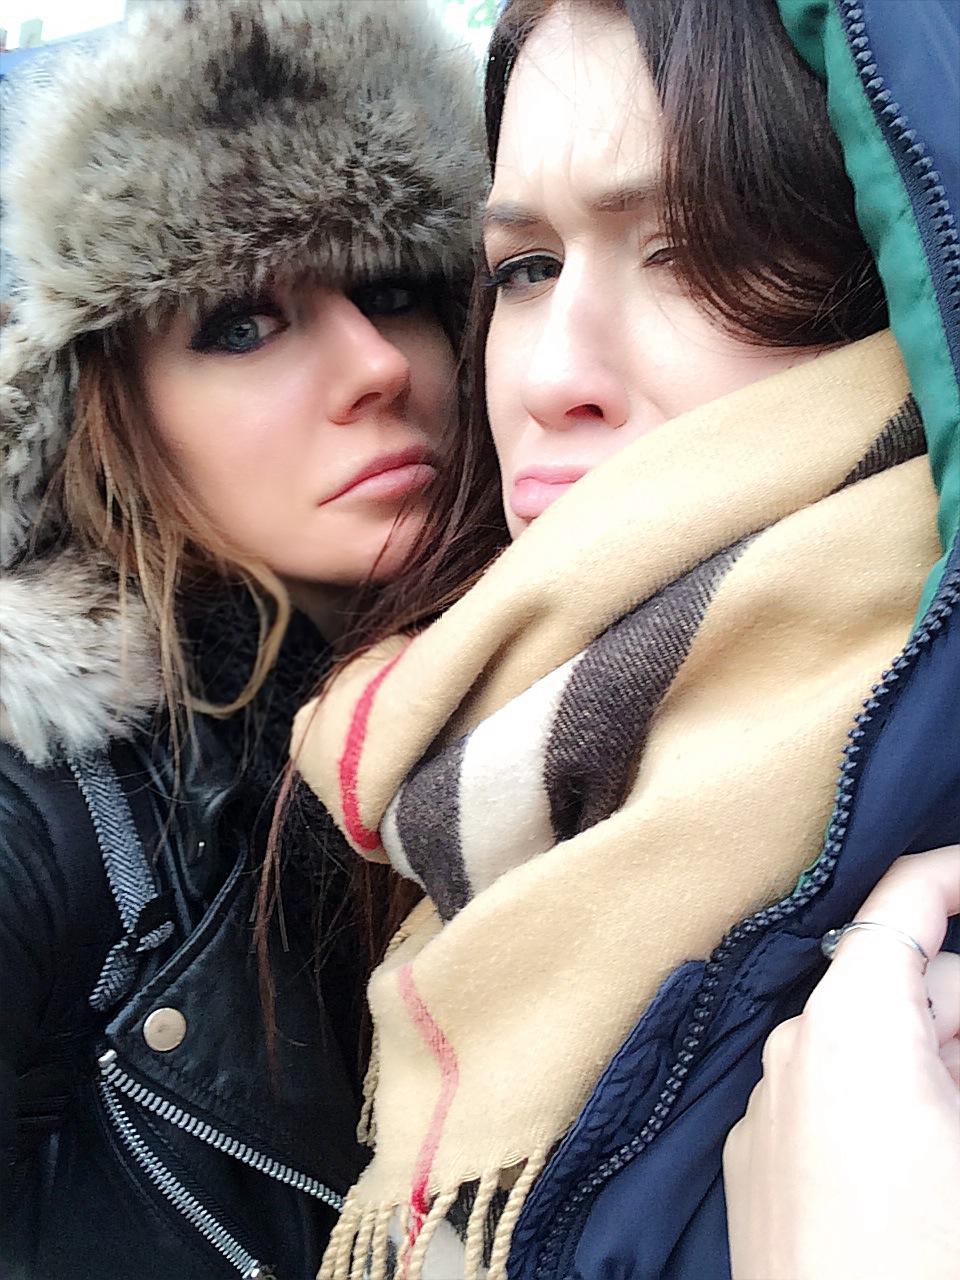 Samantha bentley and misha cross as schoolgirls 3